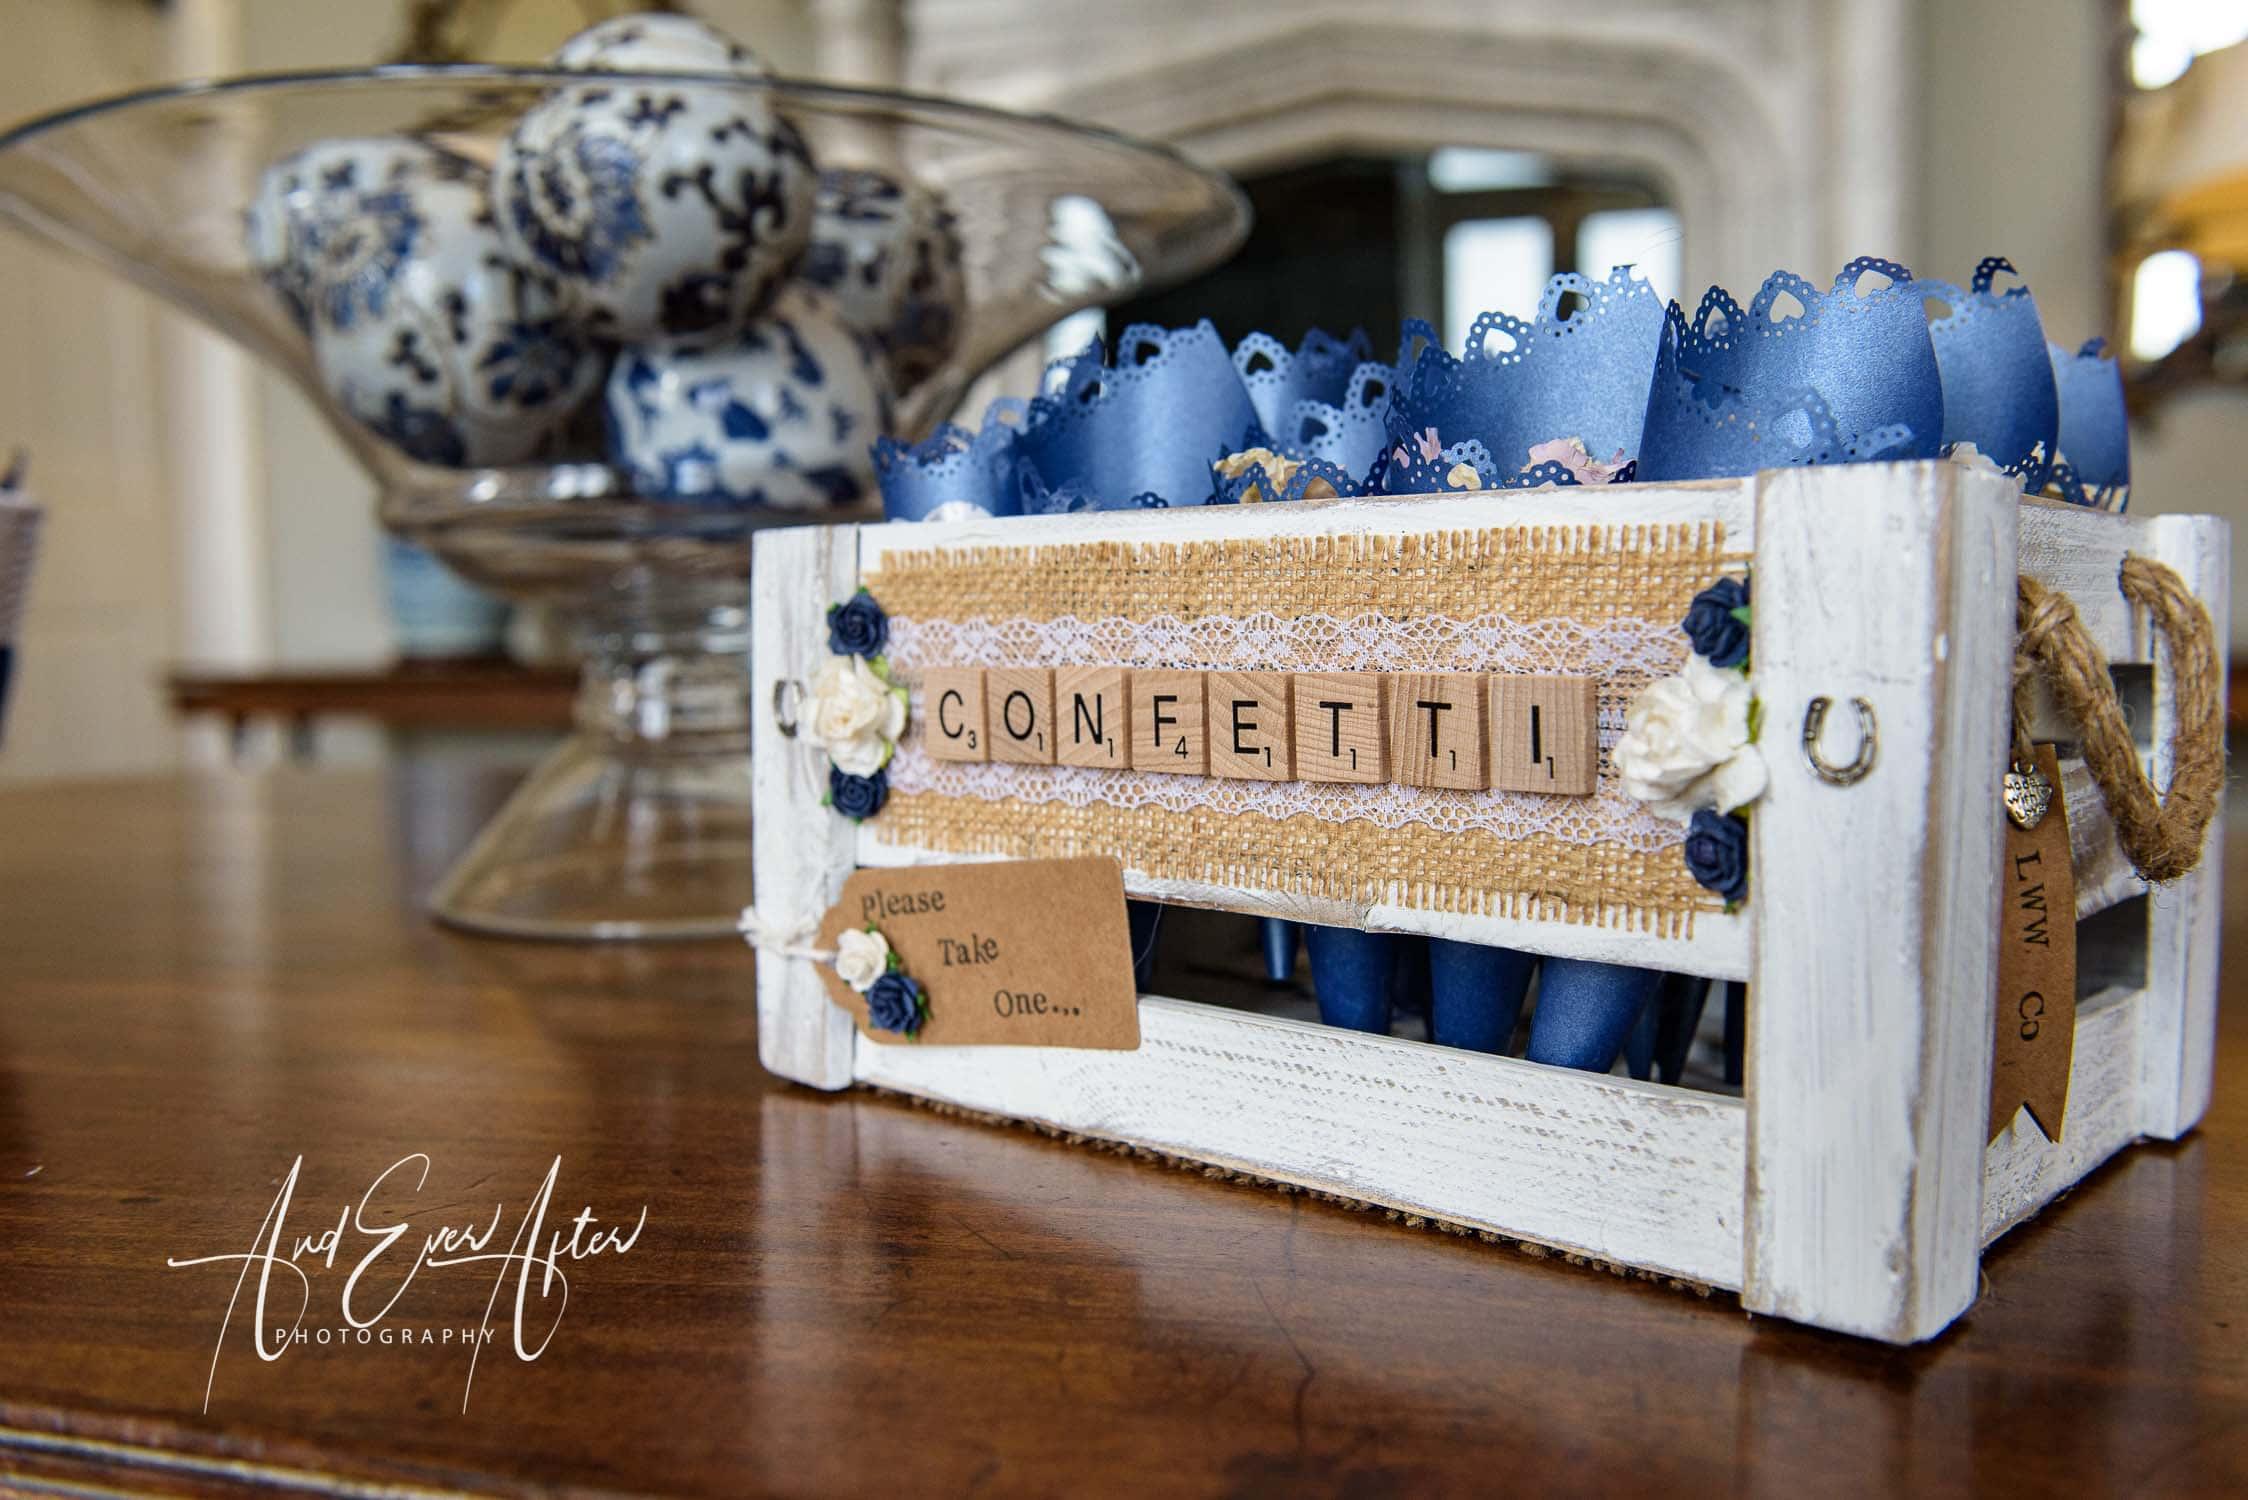 Lartington Hall, wedding venue, County Durham wedding photographer, confetti